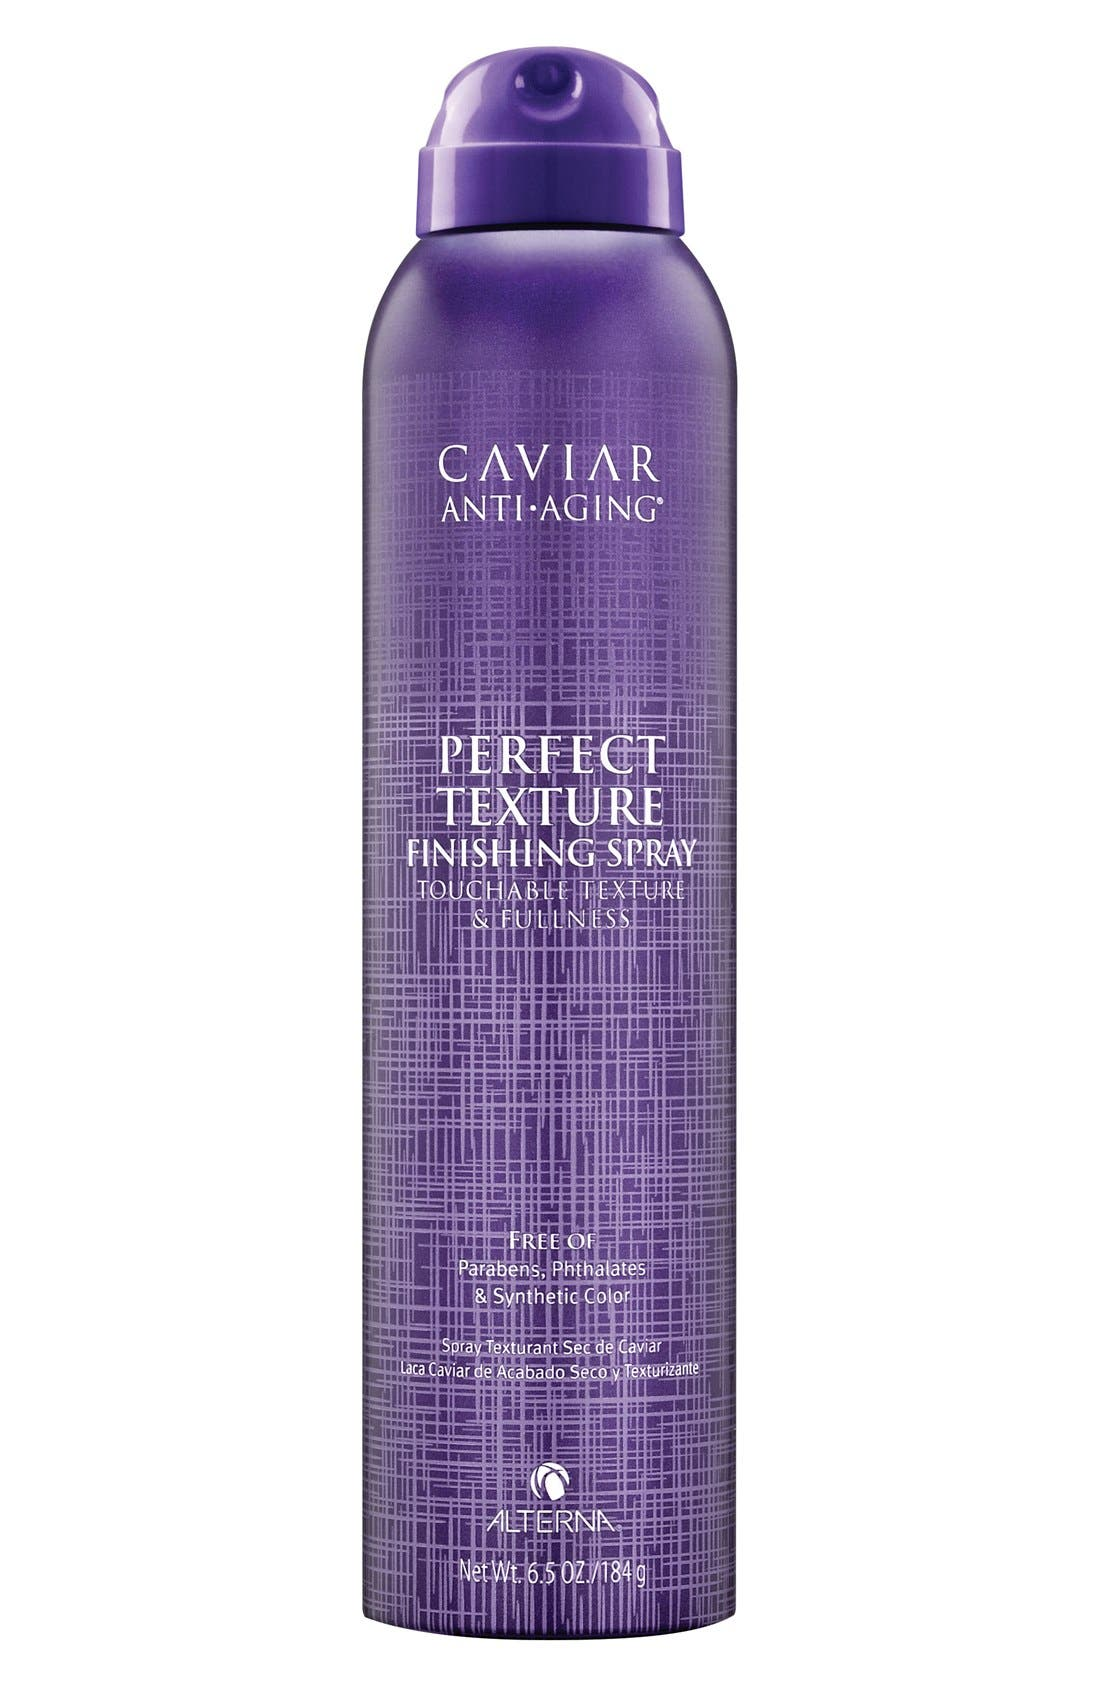 ALTERNA® Caviar Anti-Aging Perfect Texture Finishing Spray